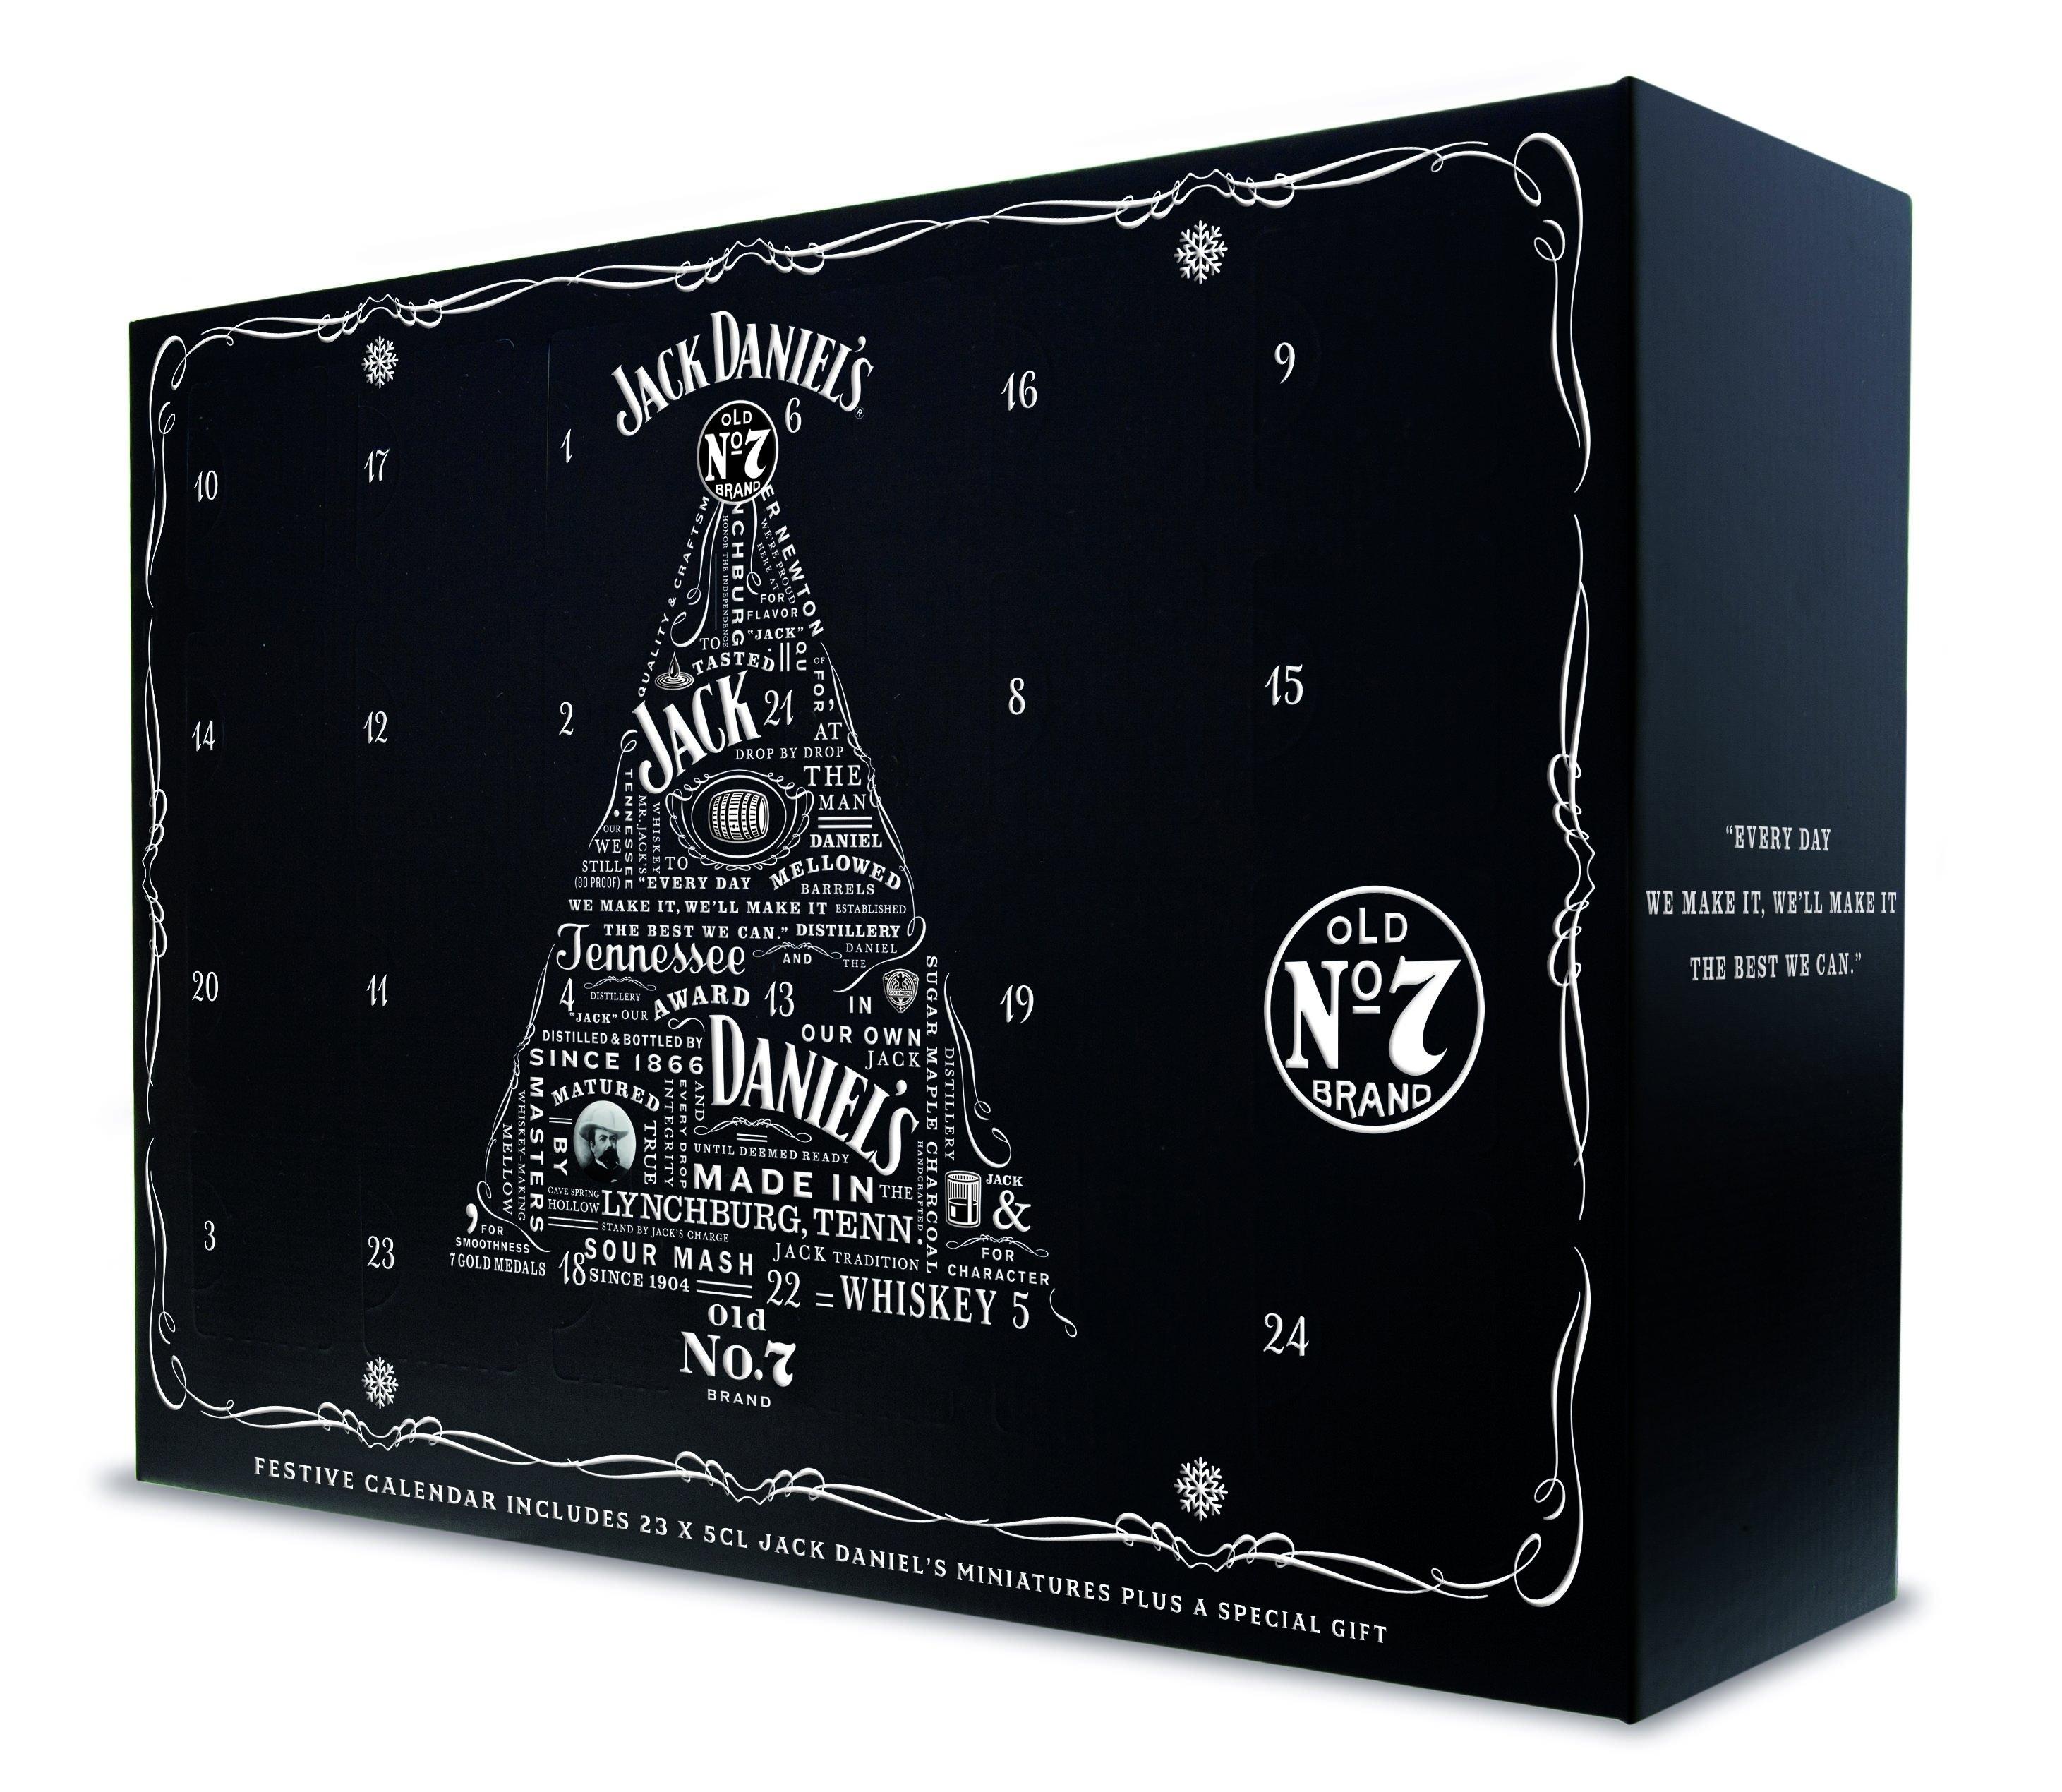 Jack Daniel's Festive Whiskey Calendar | The Jack Store No 7 Advent Calendar 2019